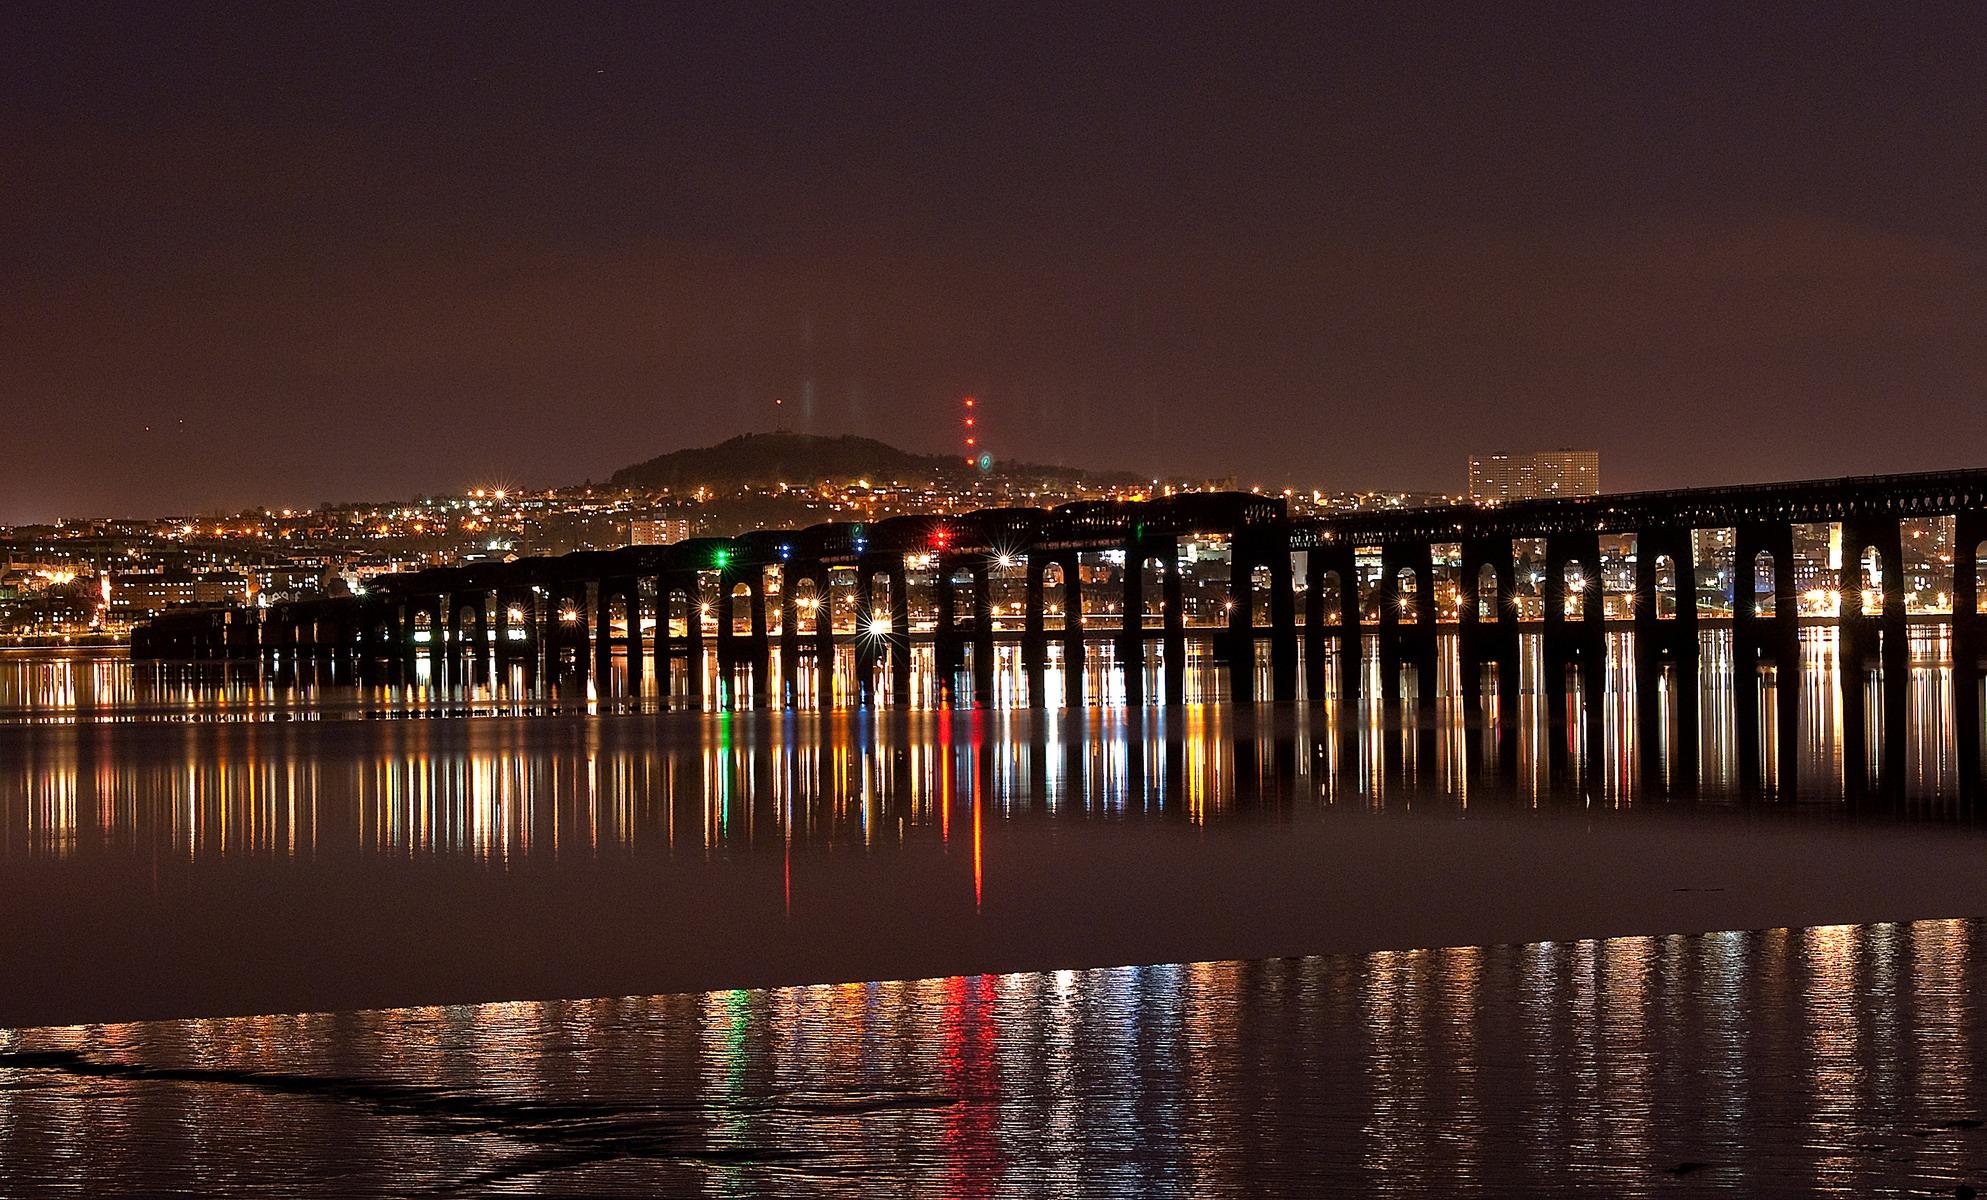 dundee_bridge-2-2